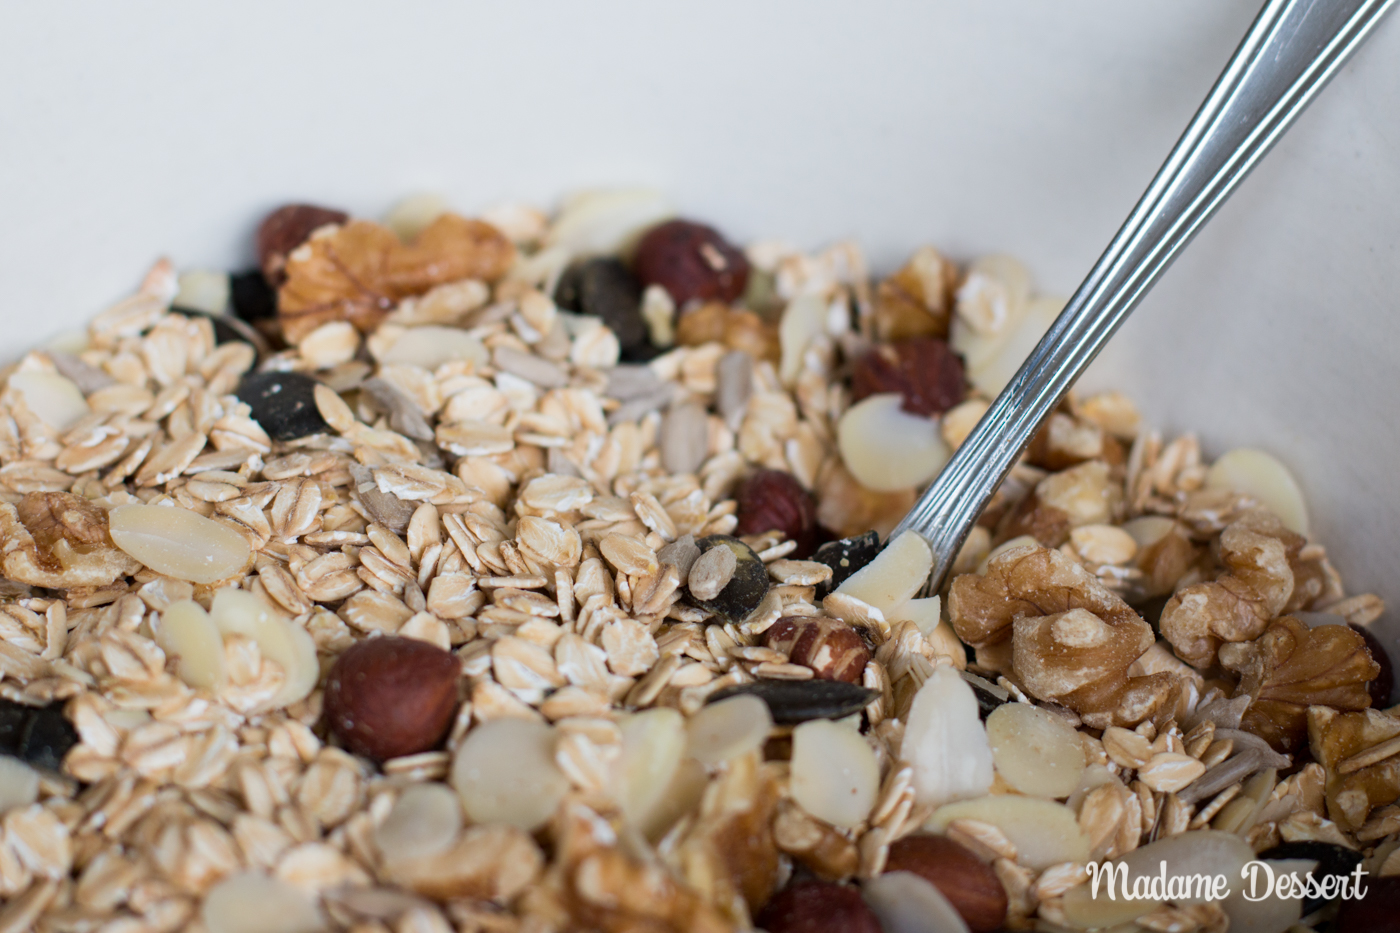 Crunchy Granola zum selber machen | Frühstücksideen | Madame Dessert